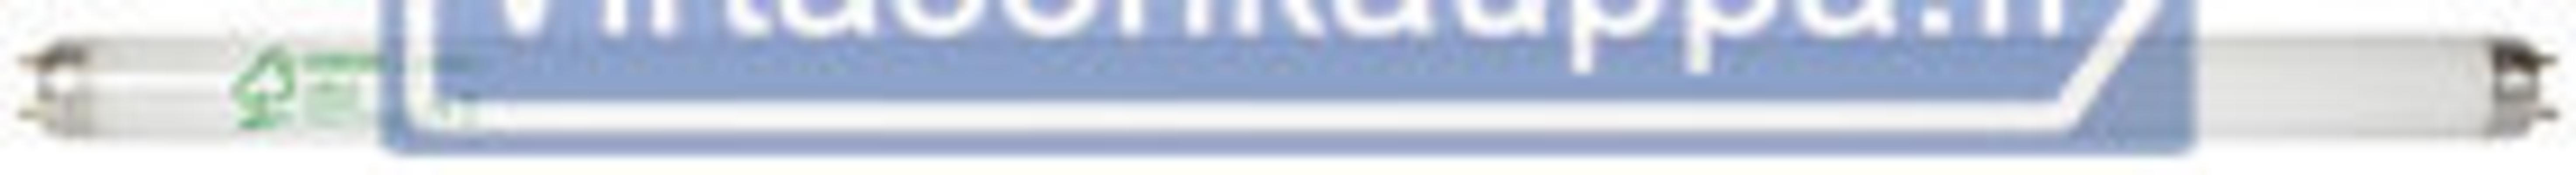 OSRAM LOISTEPUTKI 18W/827 FLH1 G13